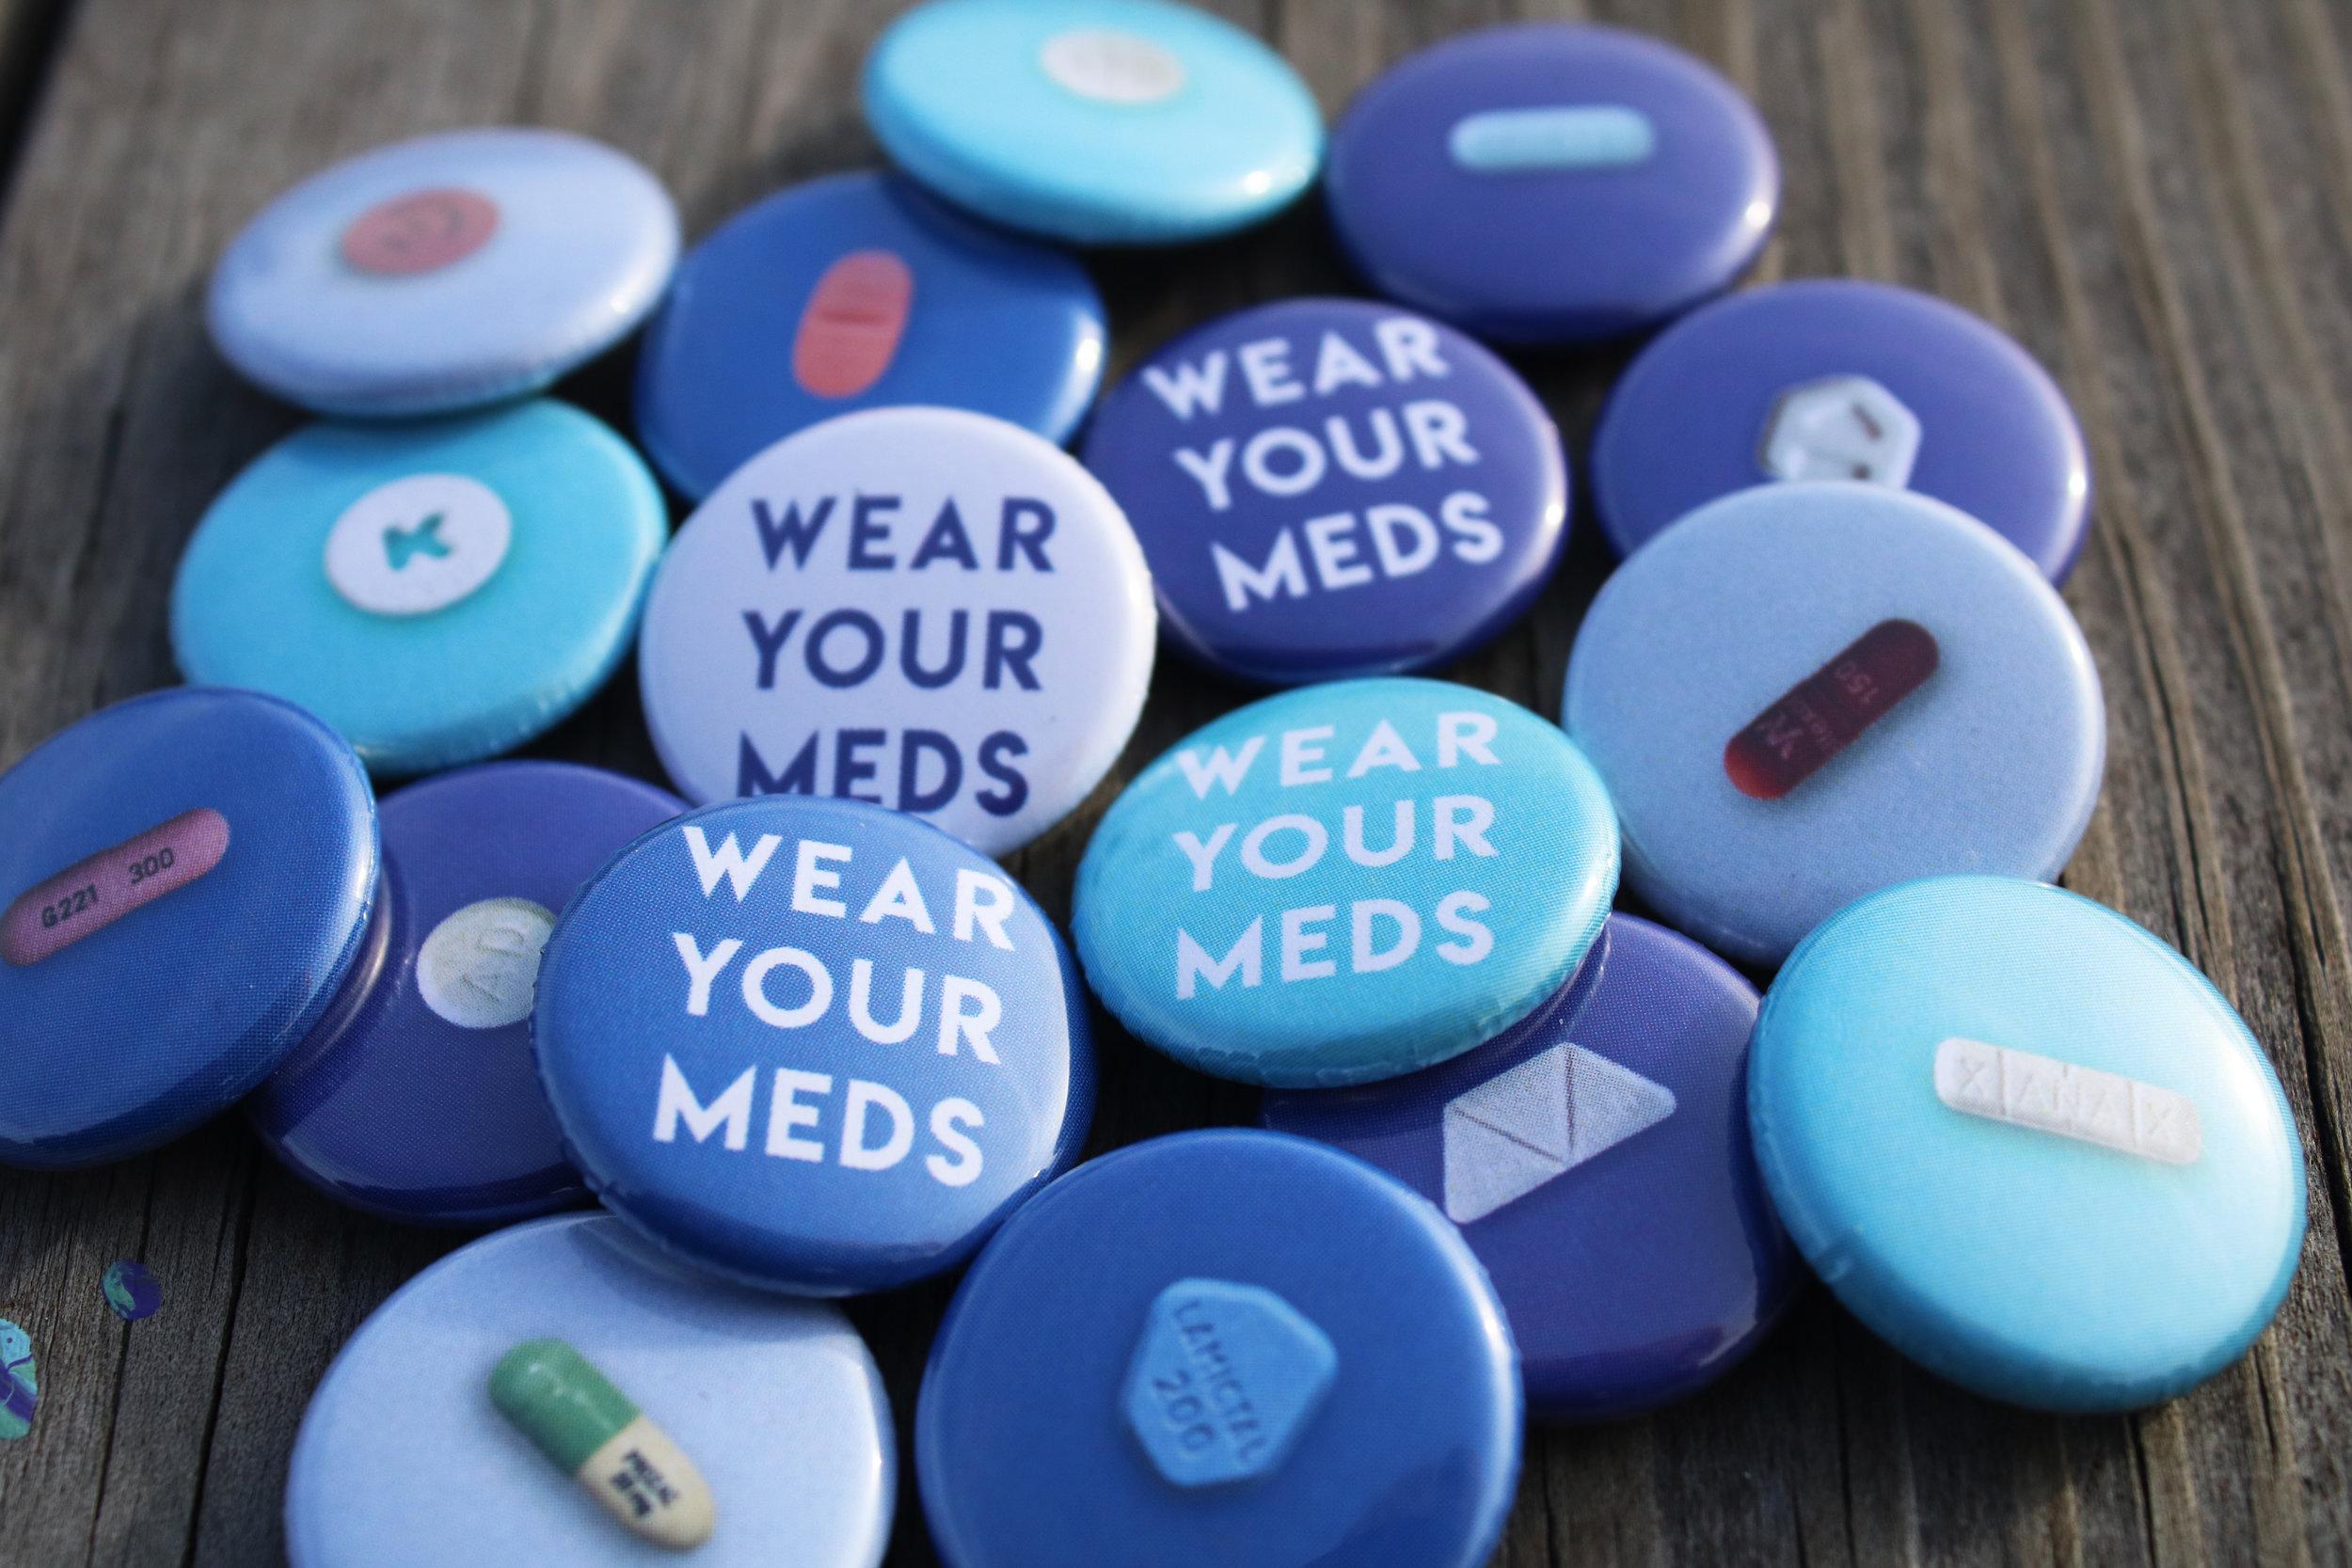 Lauren Weiss - Wear Your Meds